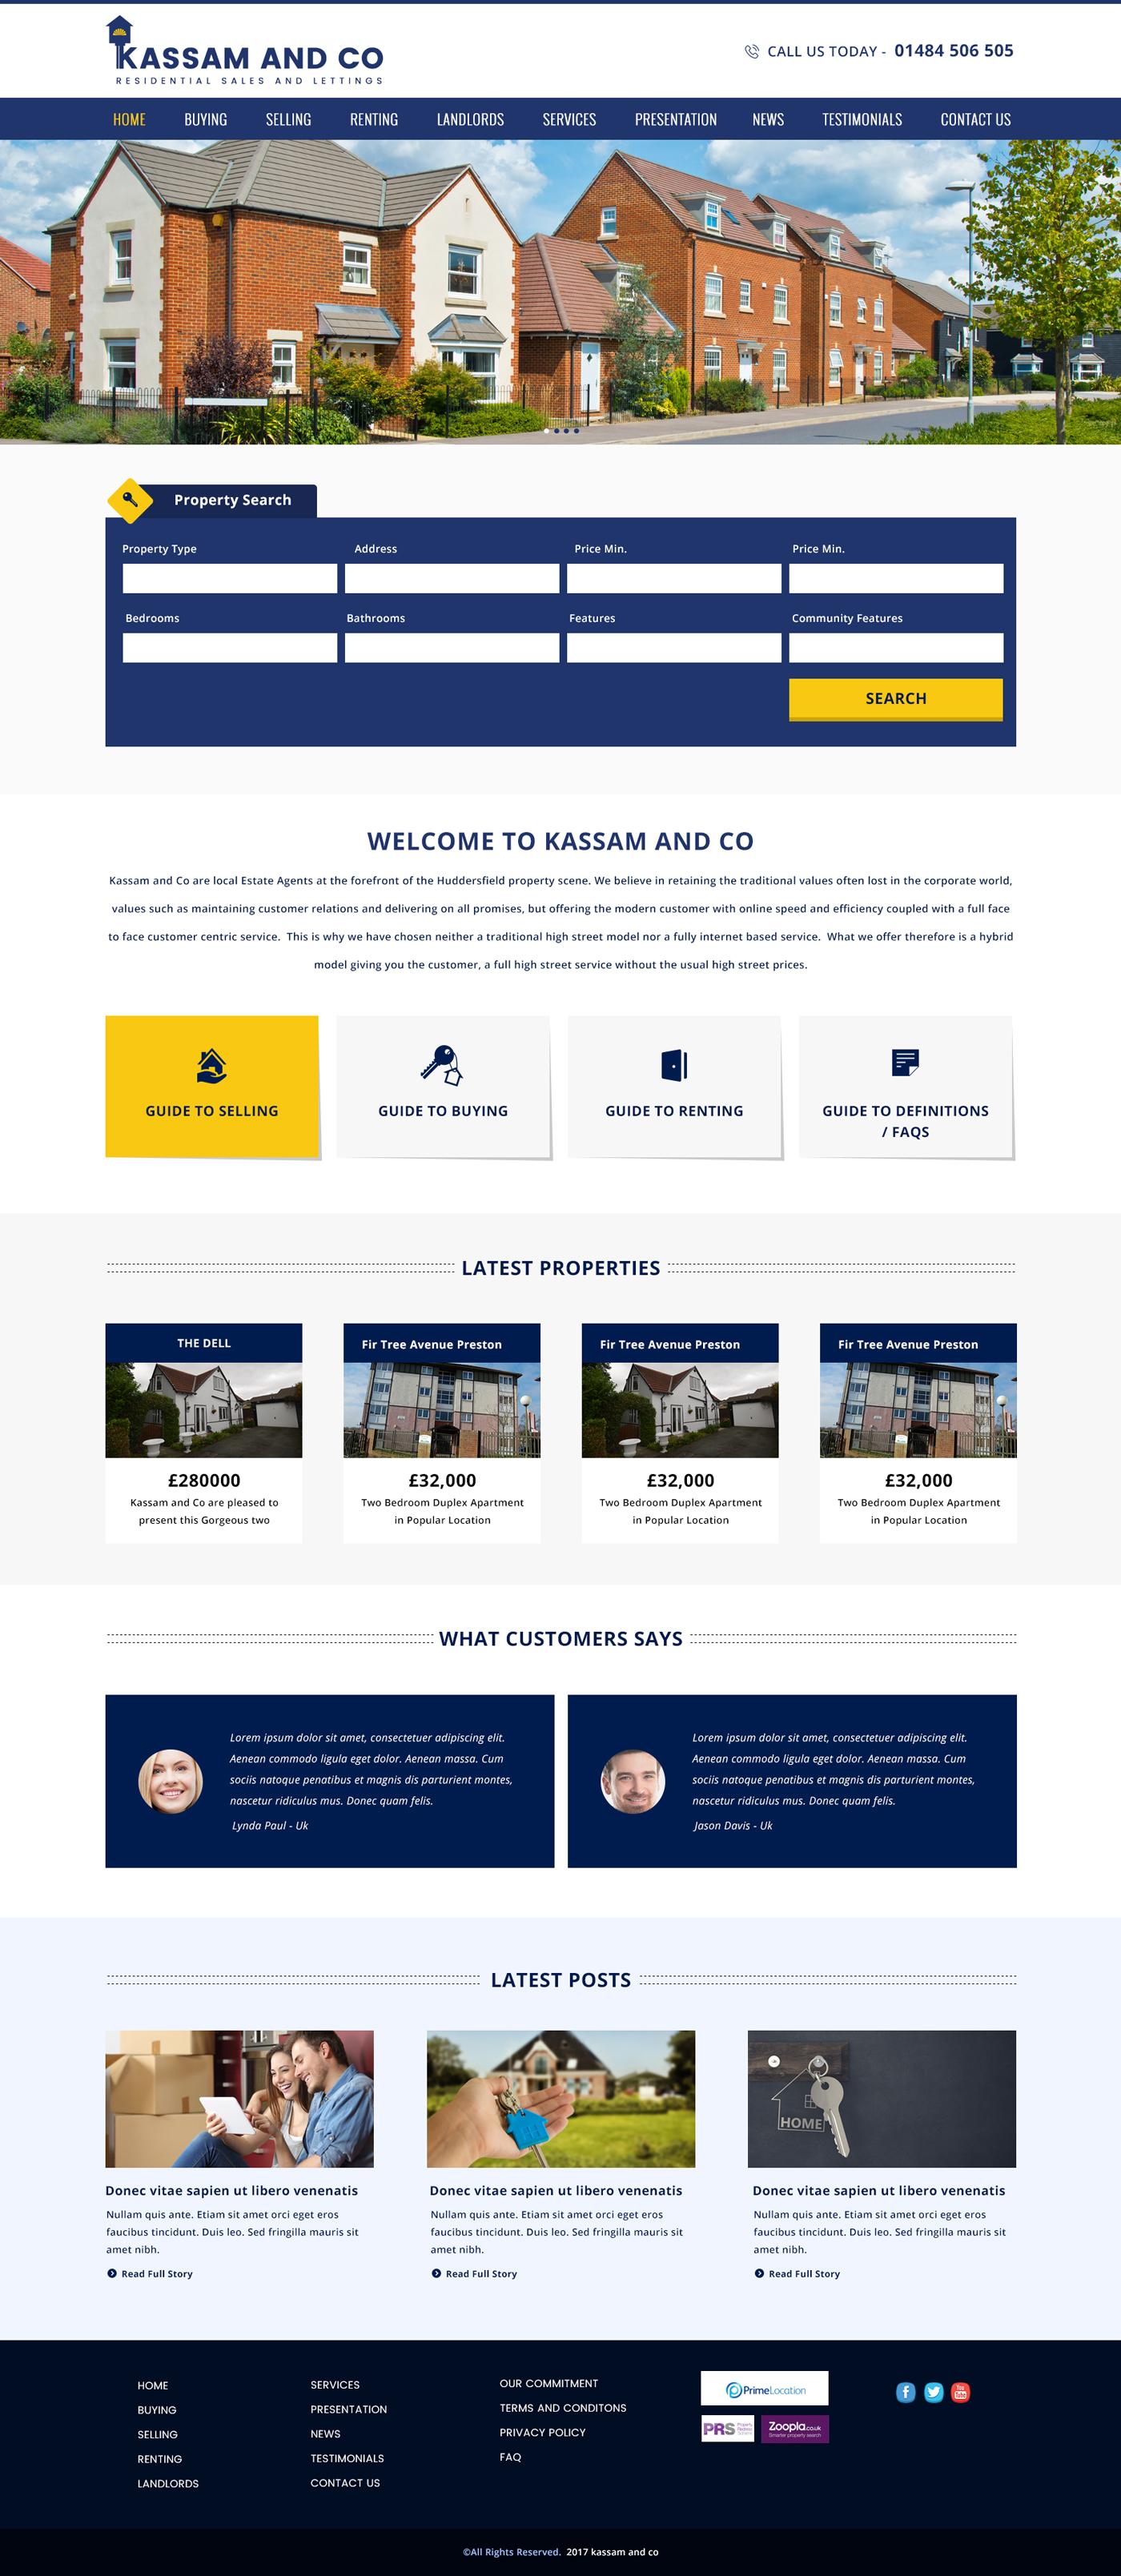 Kassam & Co Property, Property Website Design, Property Web Design